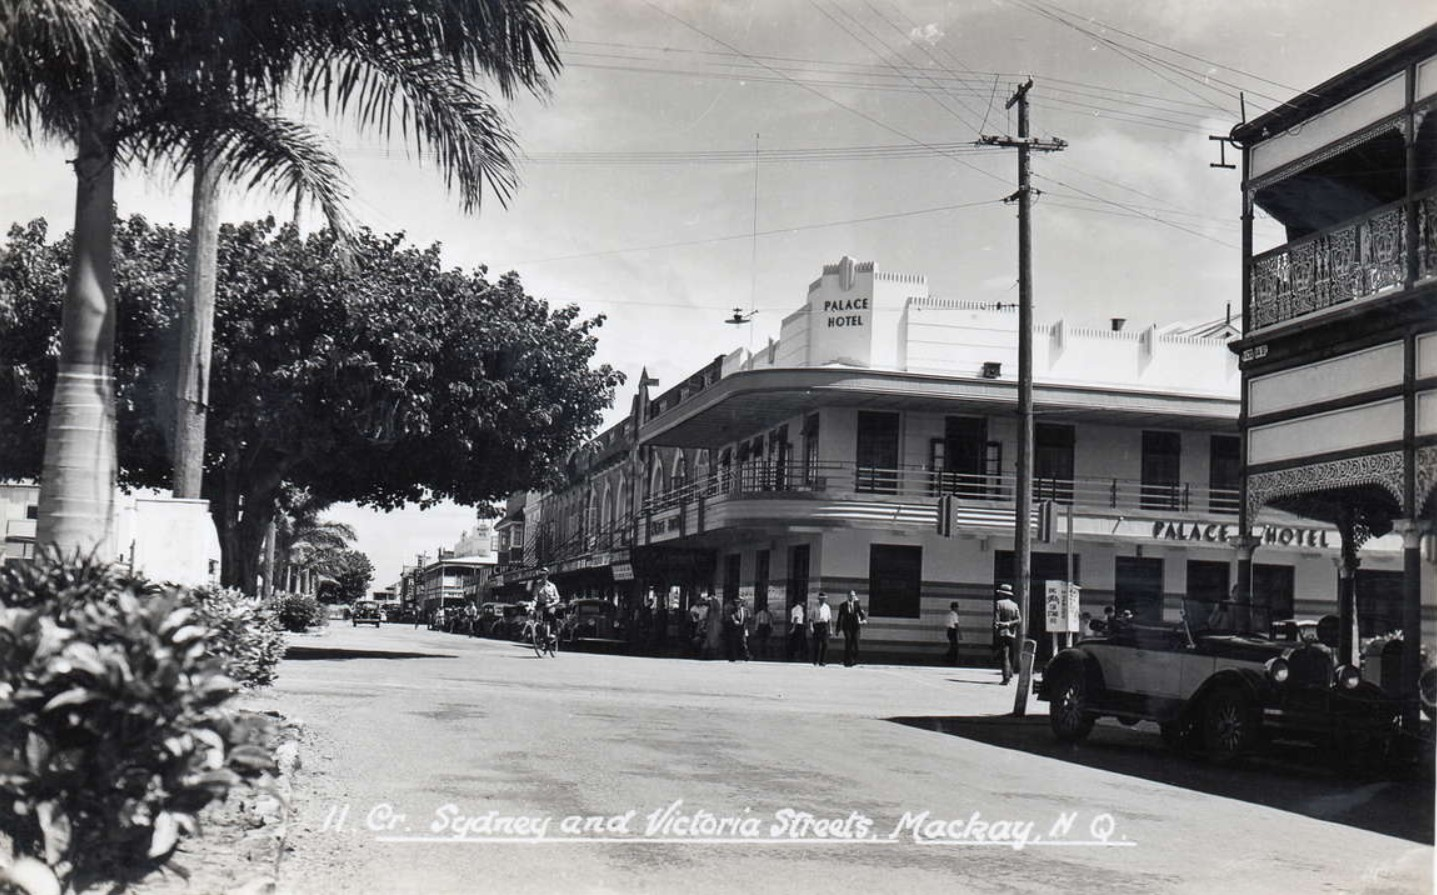 palace hptel mackay 1946 bonzledotcom